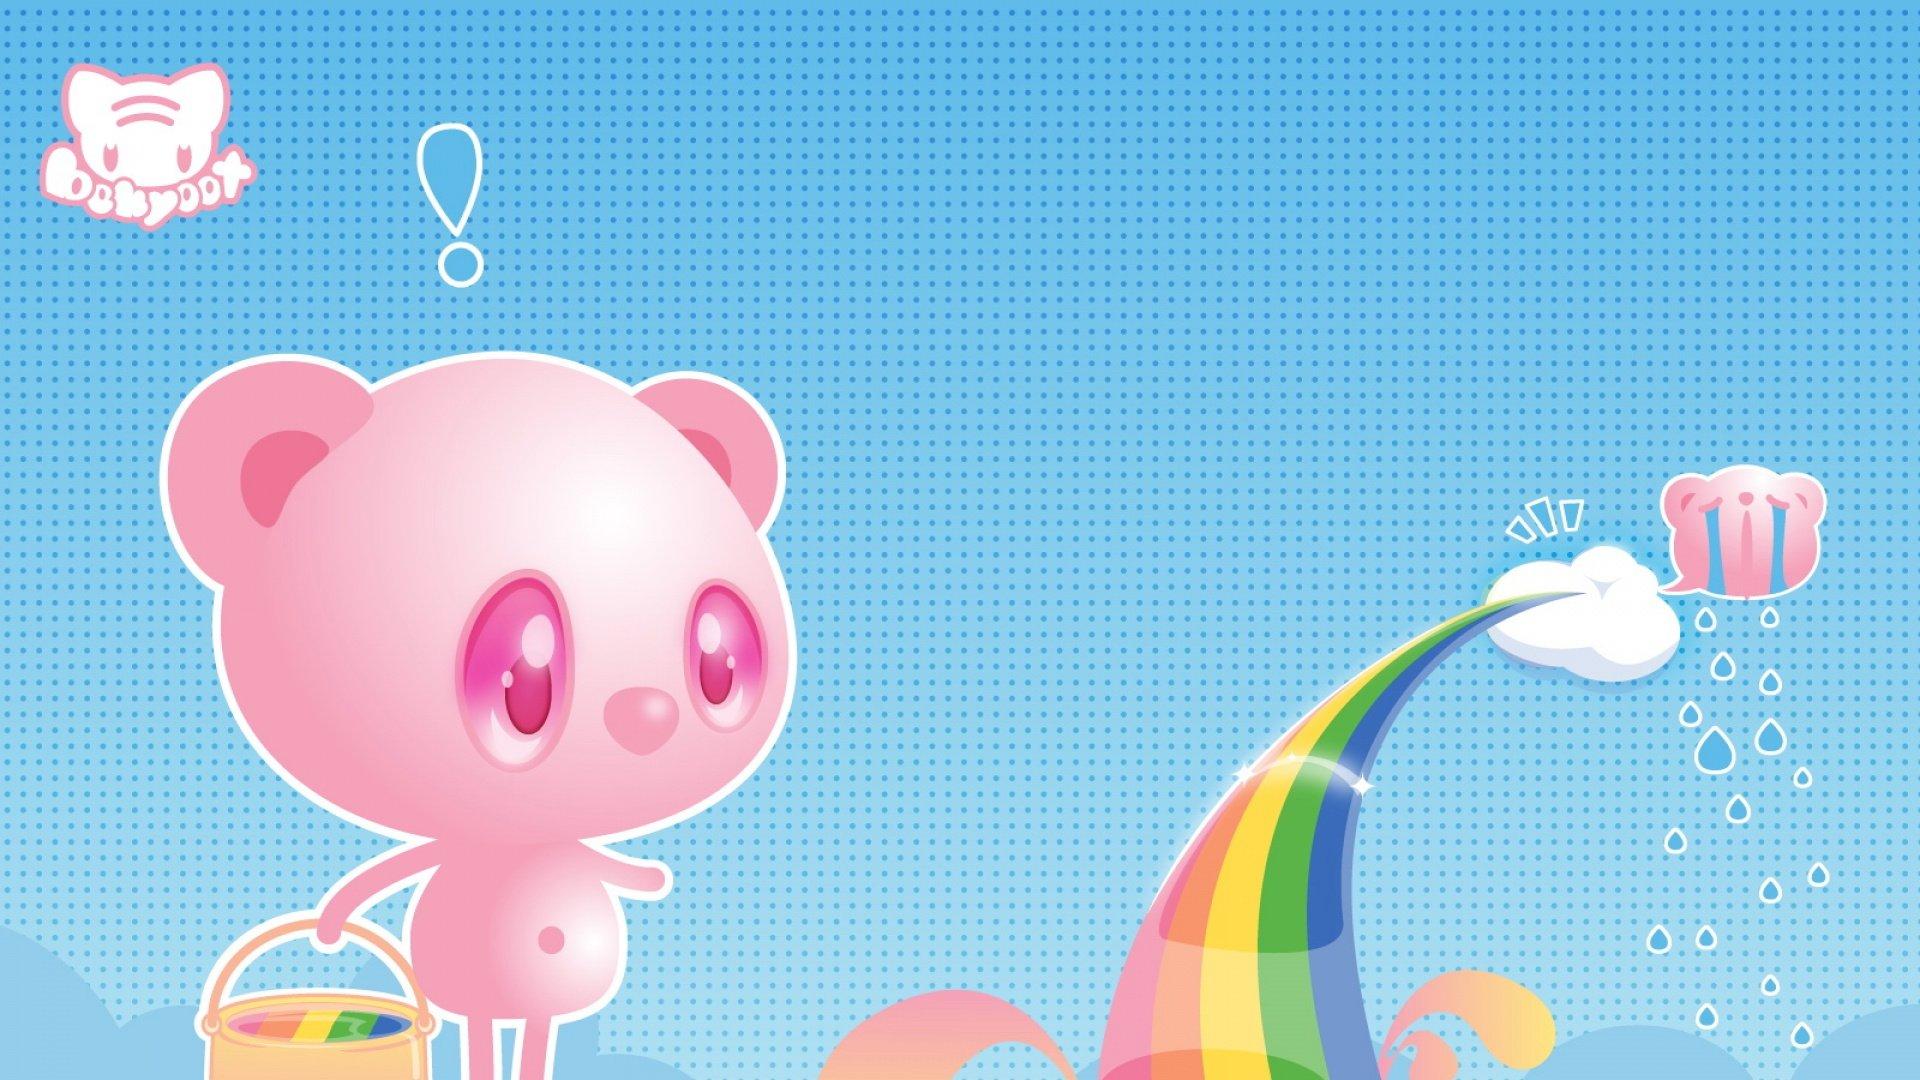 android安卓动漫 可爱高清手机壁纸免费下载,安心市场